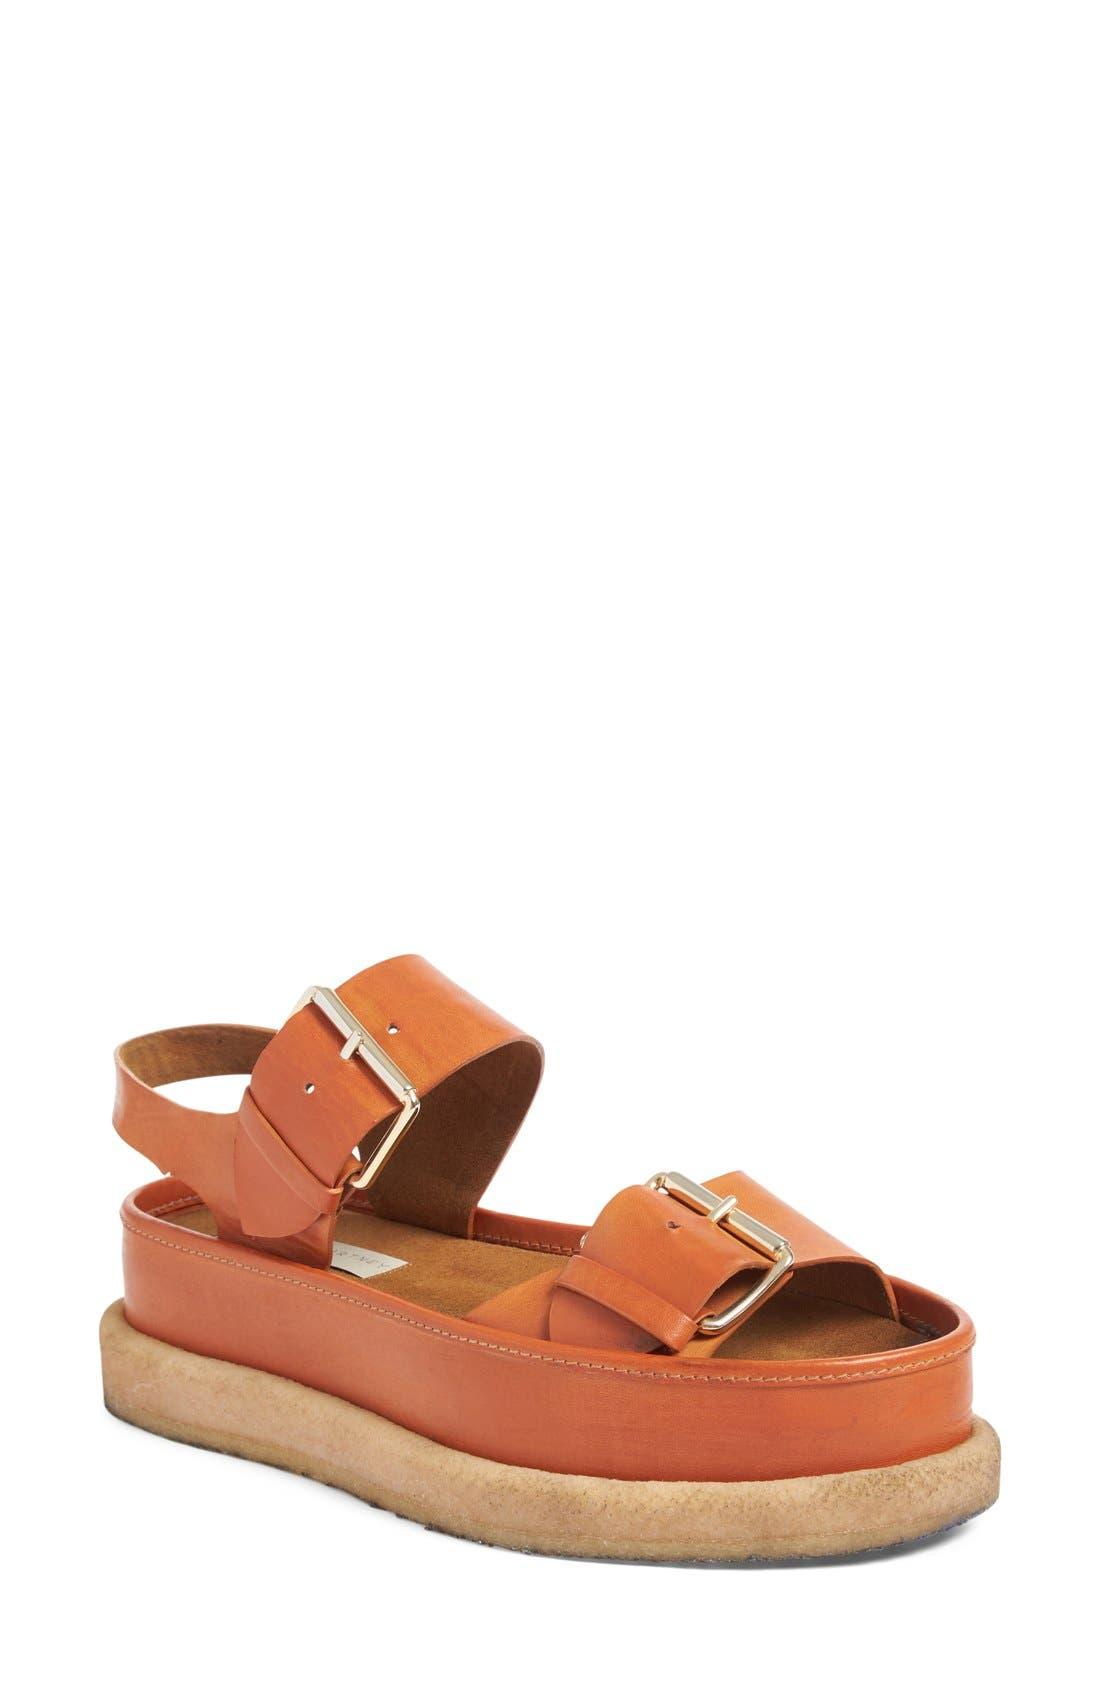 Stella McCartney Buckle Platform Sandal